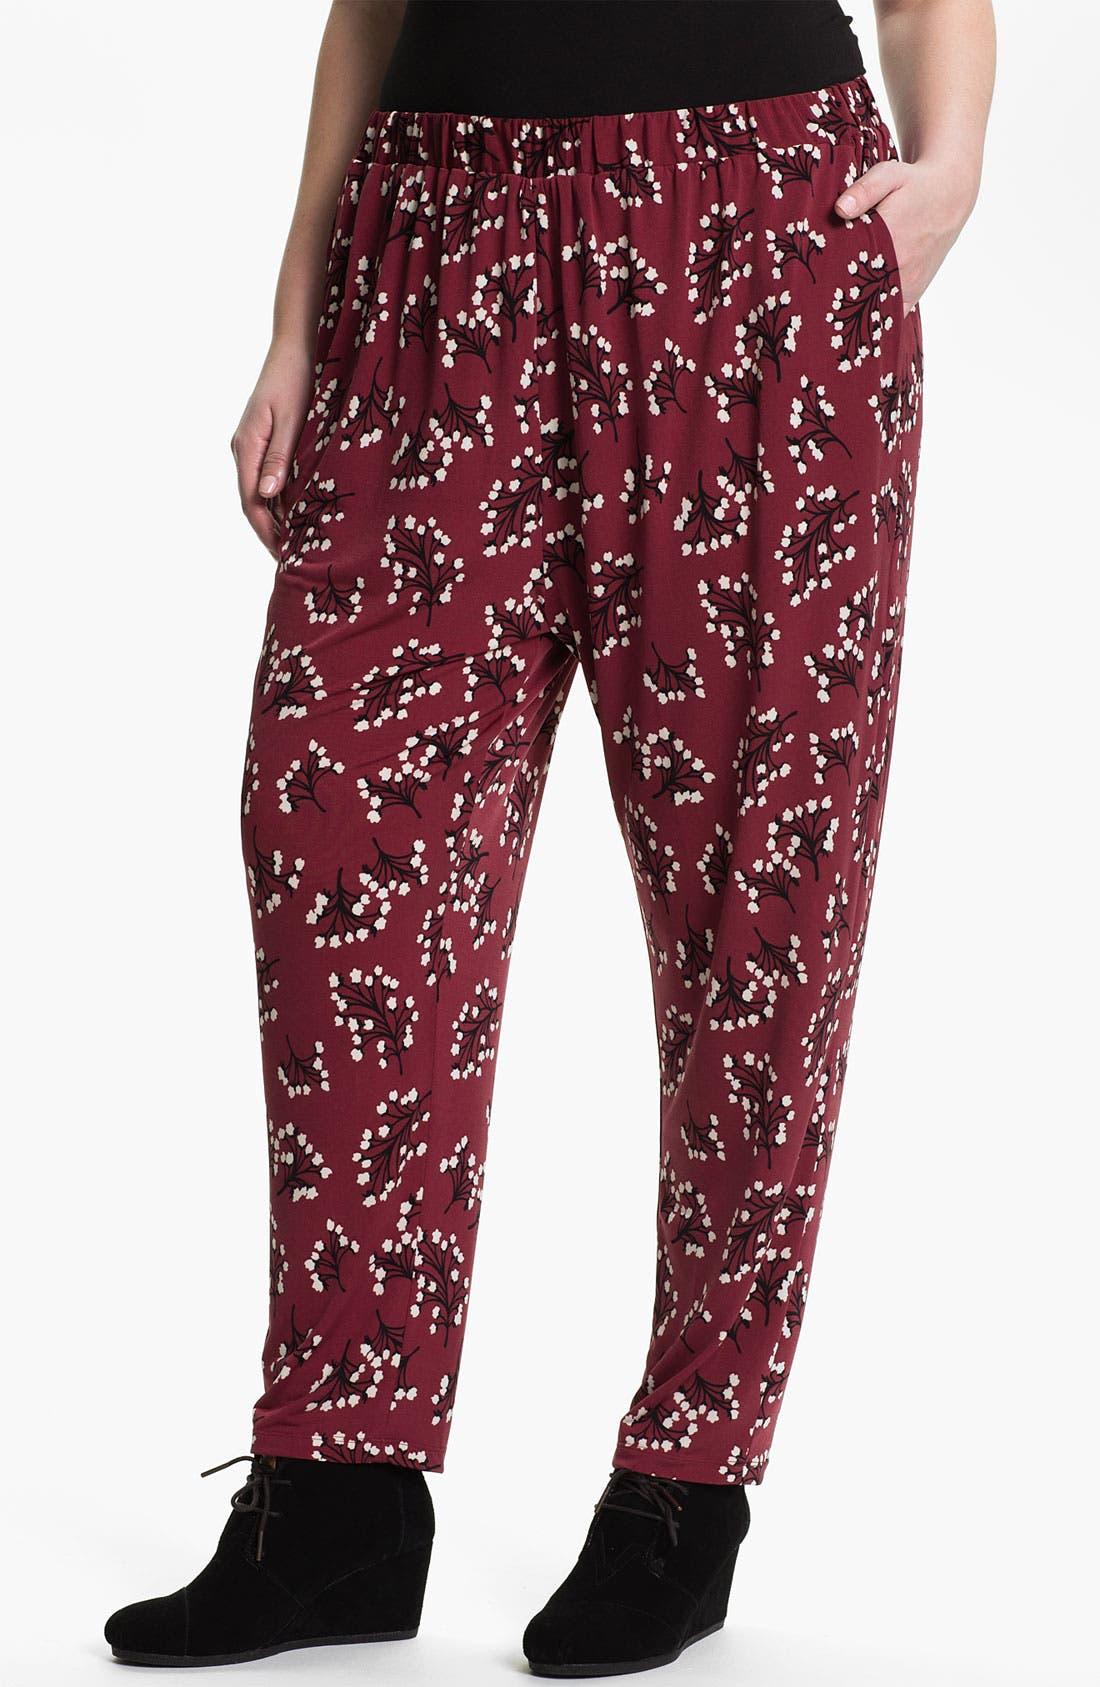 Alternate Image 1 Selected - Evans 'Mimosa' Pants (Plus Size)